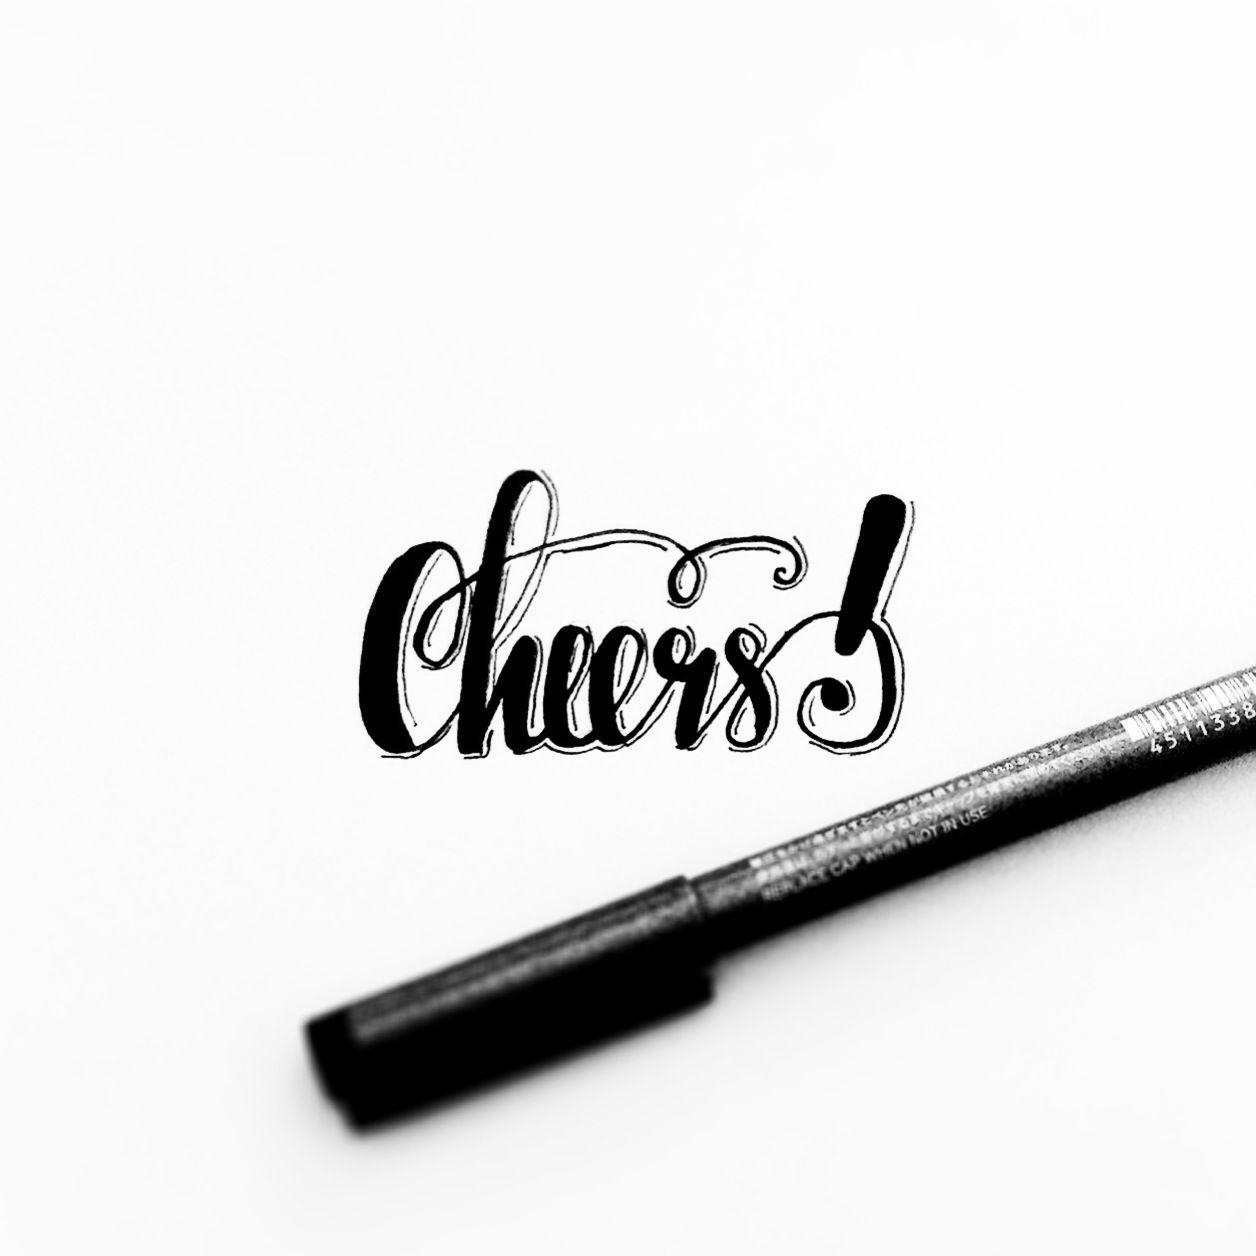 cheers #kalligrafie #kalligraphy #kalligraffiti #calligrafie, Einladung